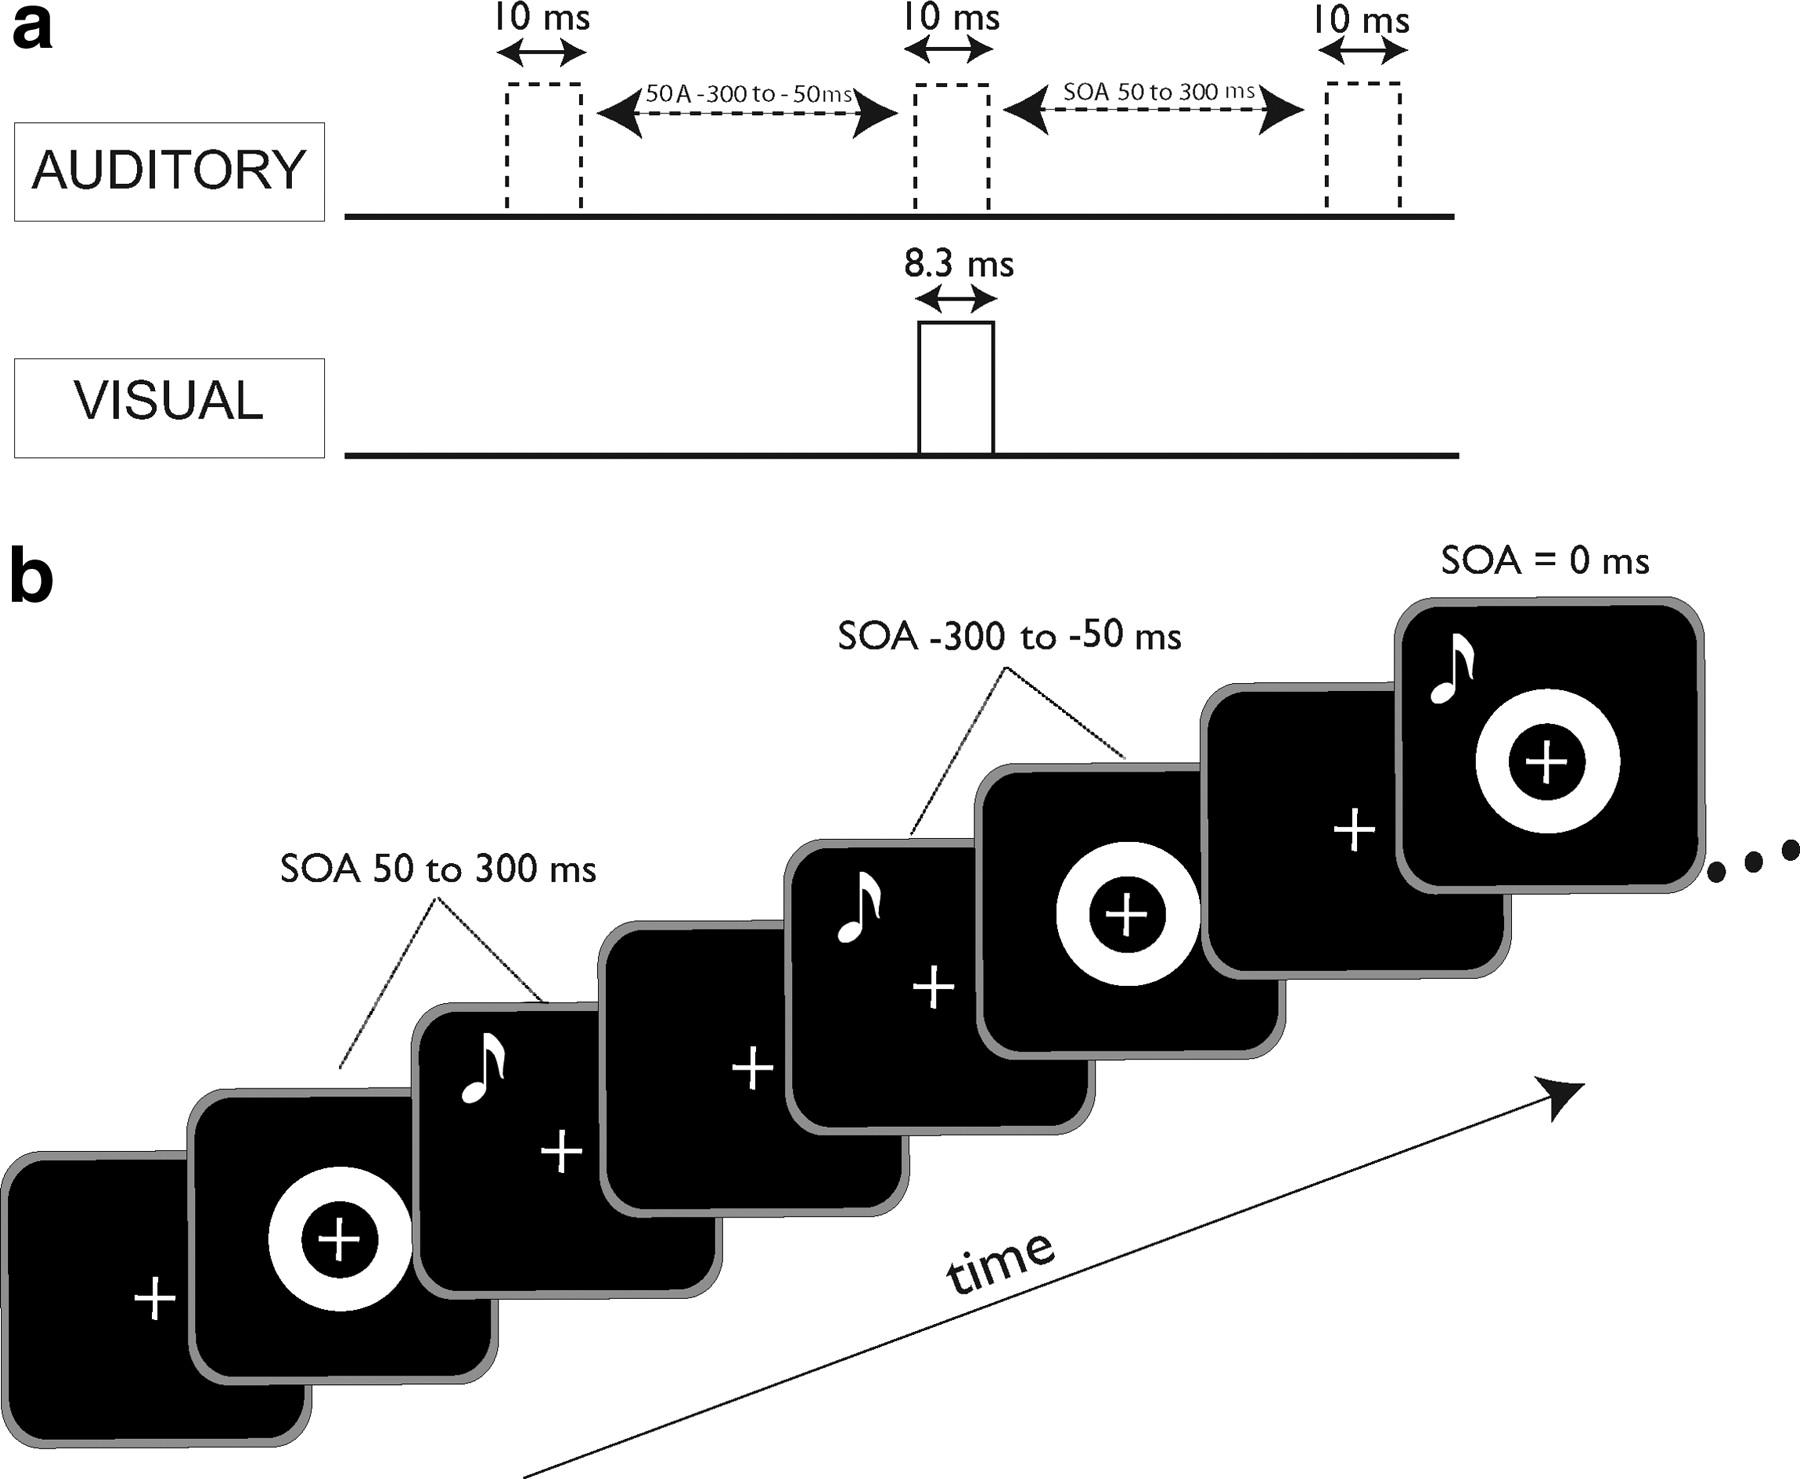 perceptual training narrows the temporal window of multisensory